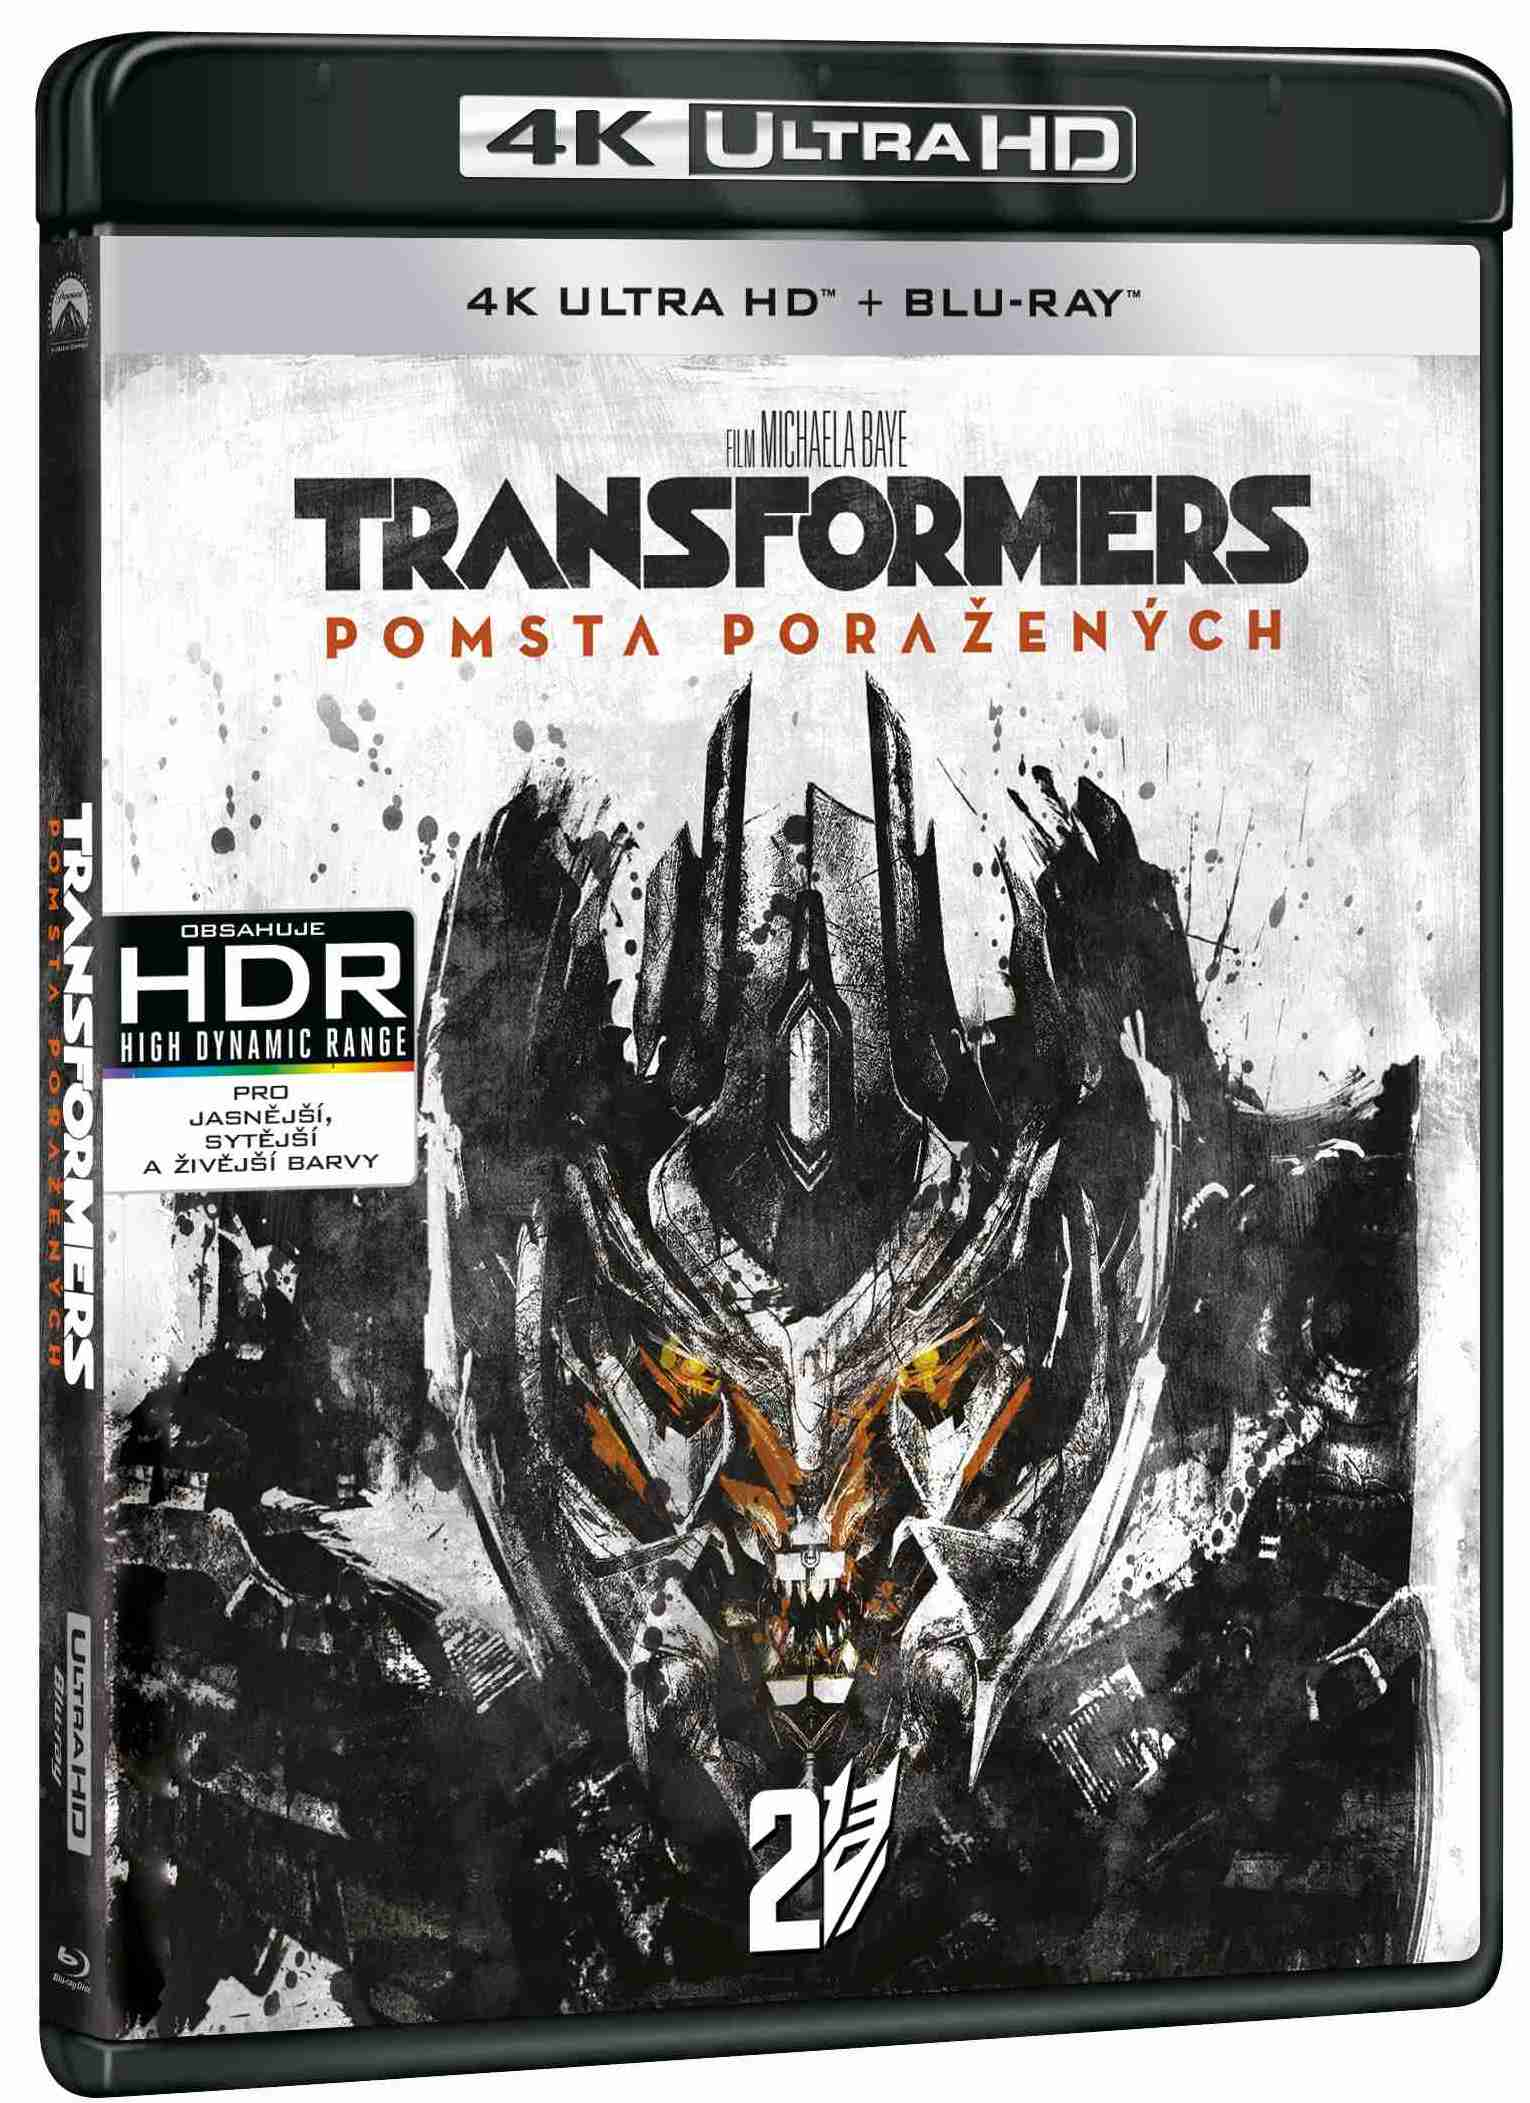 TRANSFORMERS: POMSTA PORAŽENÝCH (4K ULTRA HD) - UHD Blu-ray + Blu-ray (2 BD)